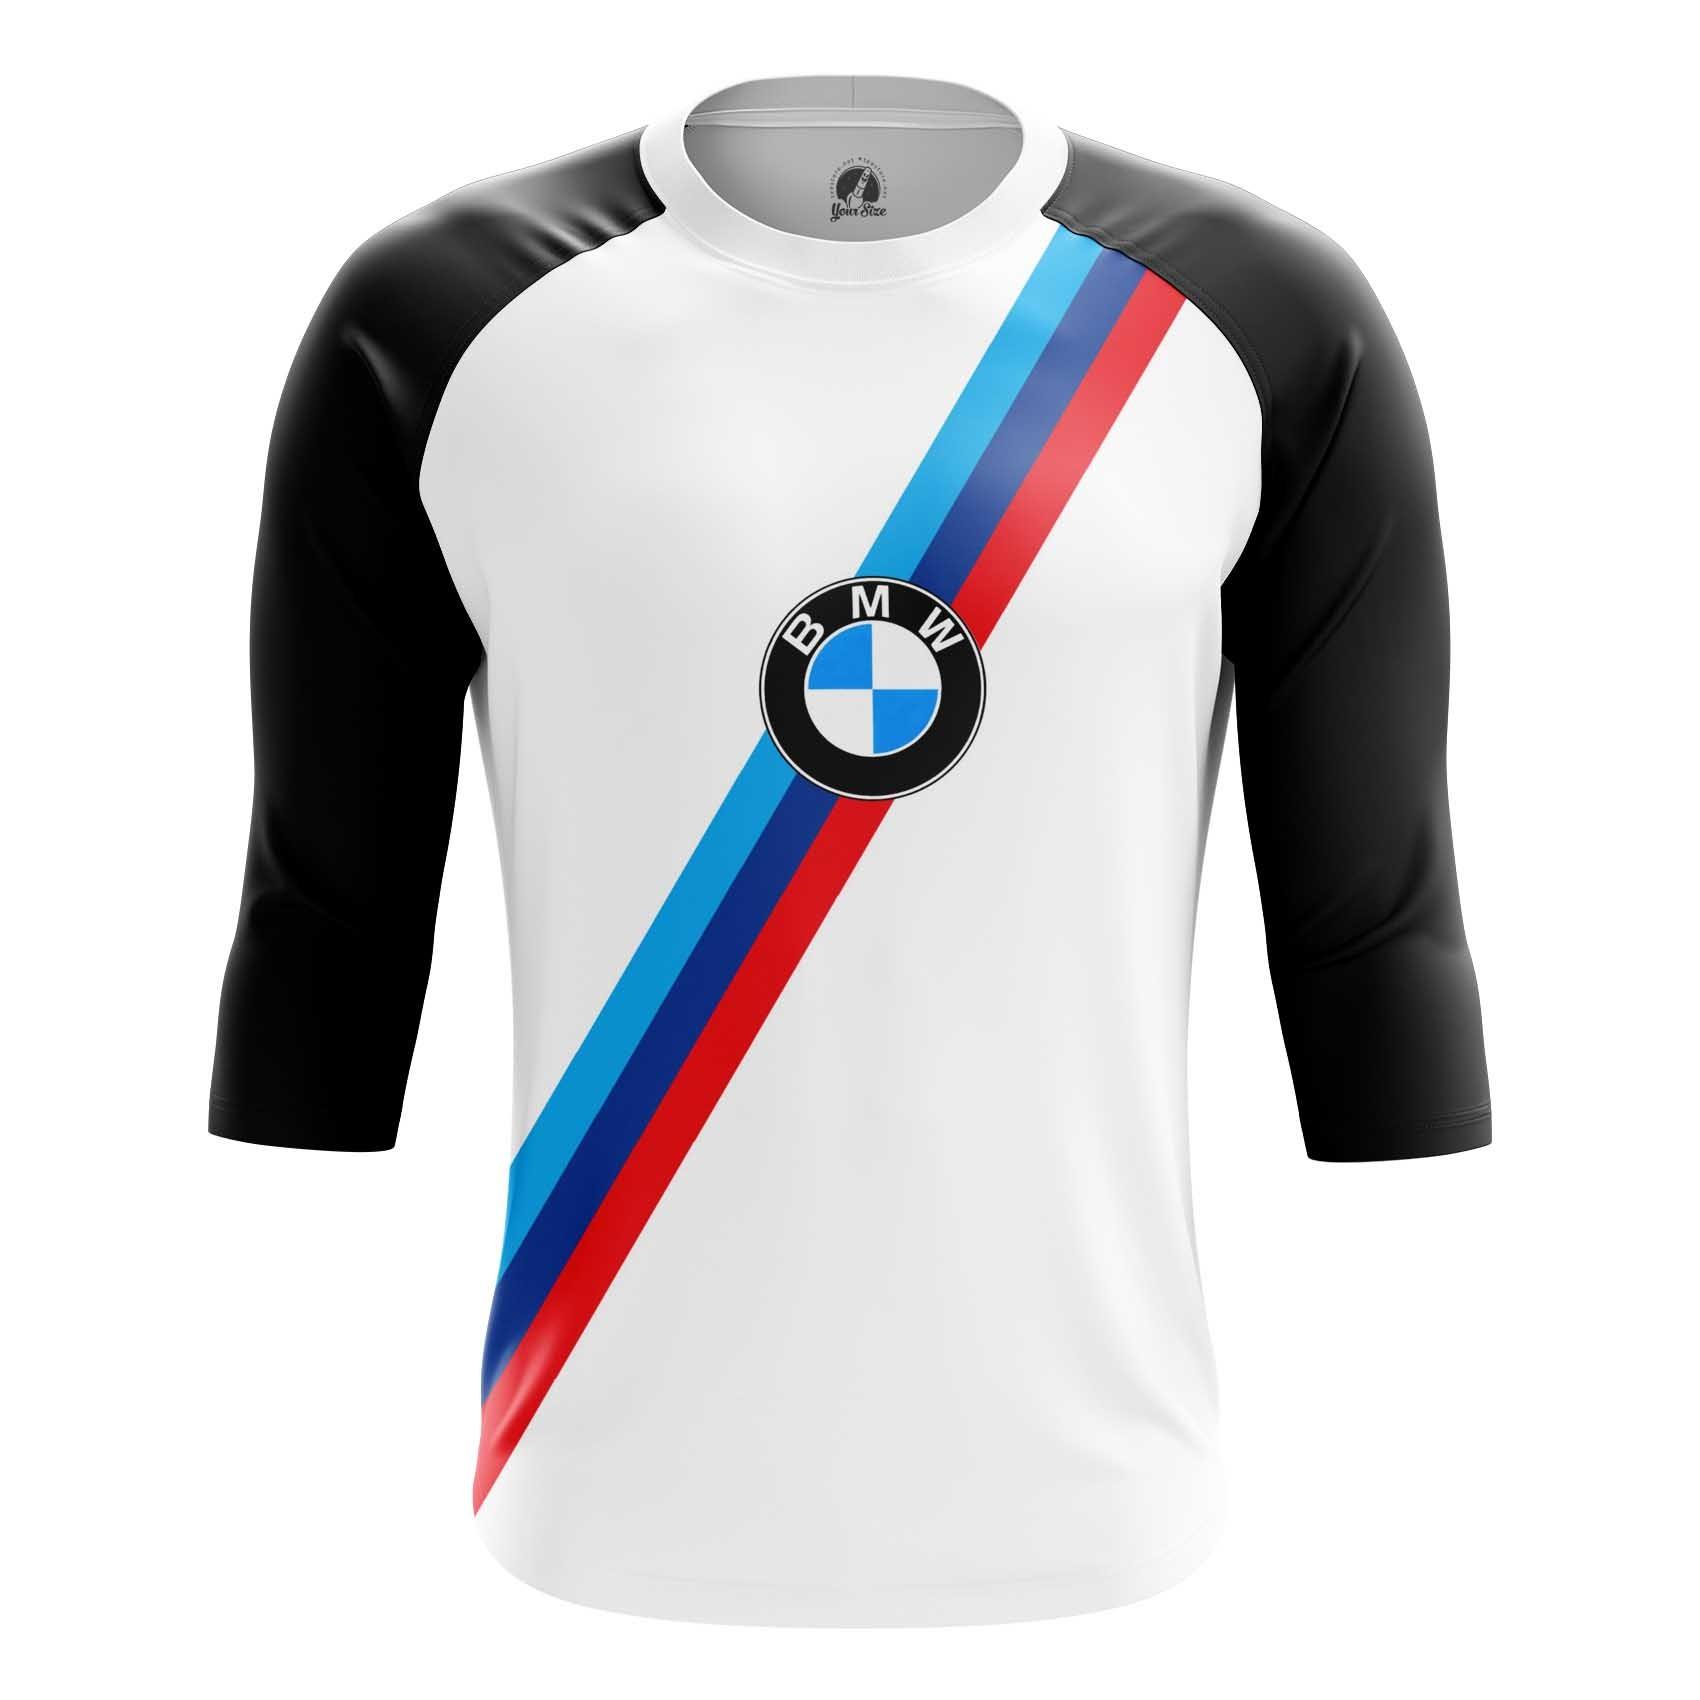 Merchandise Men'S T-Shirt Bmw Art Car Logo Emblem Series Clothing